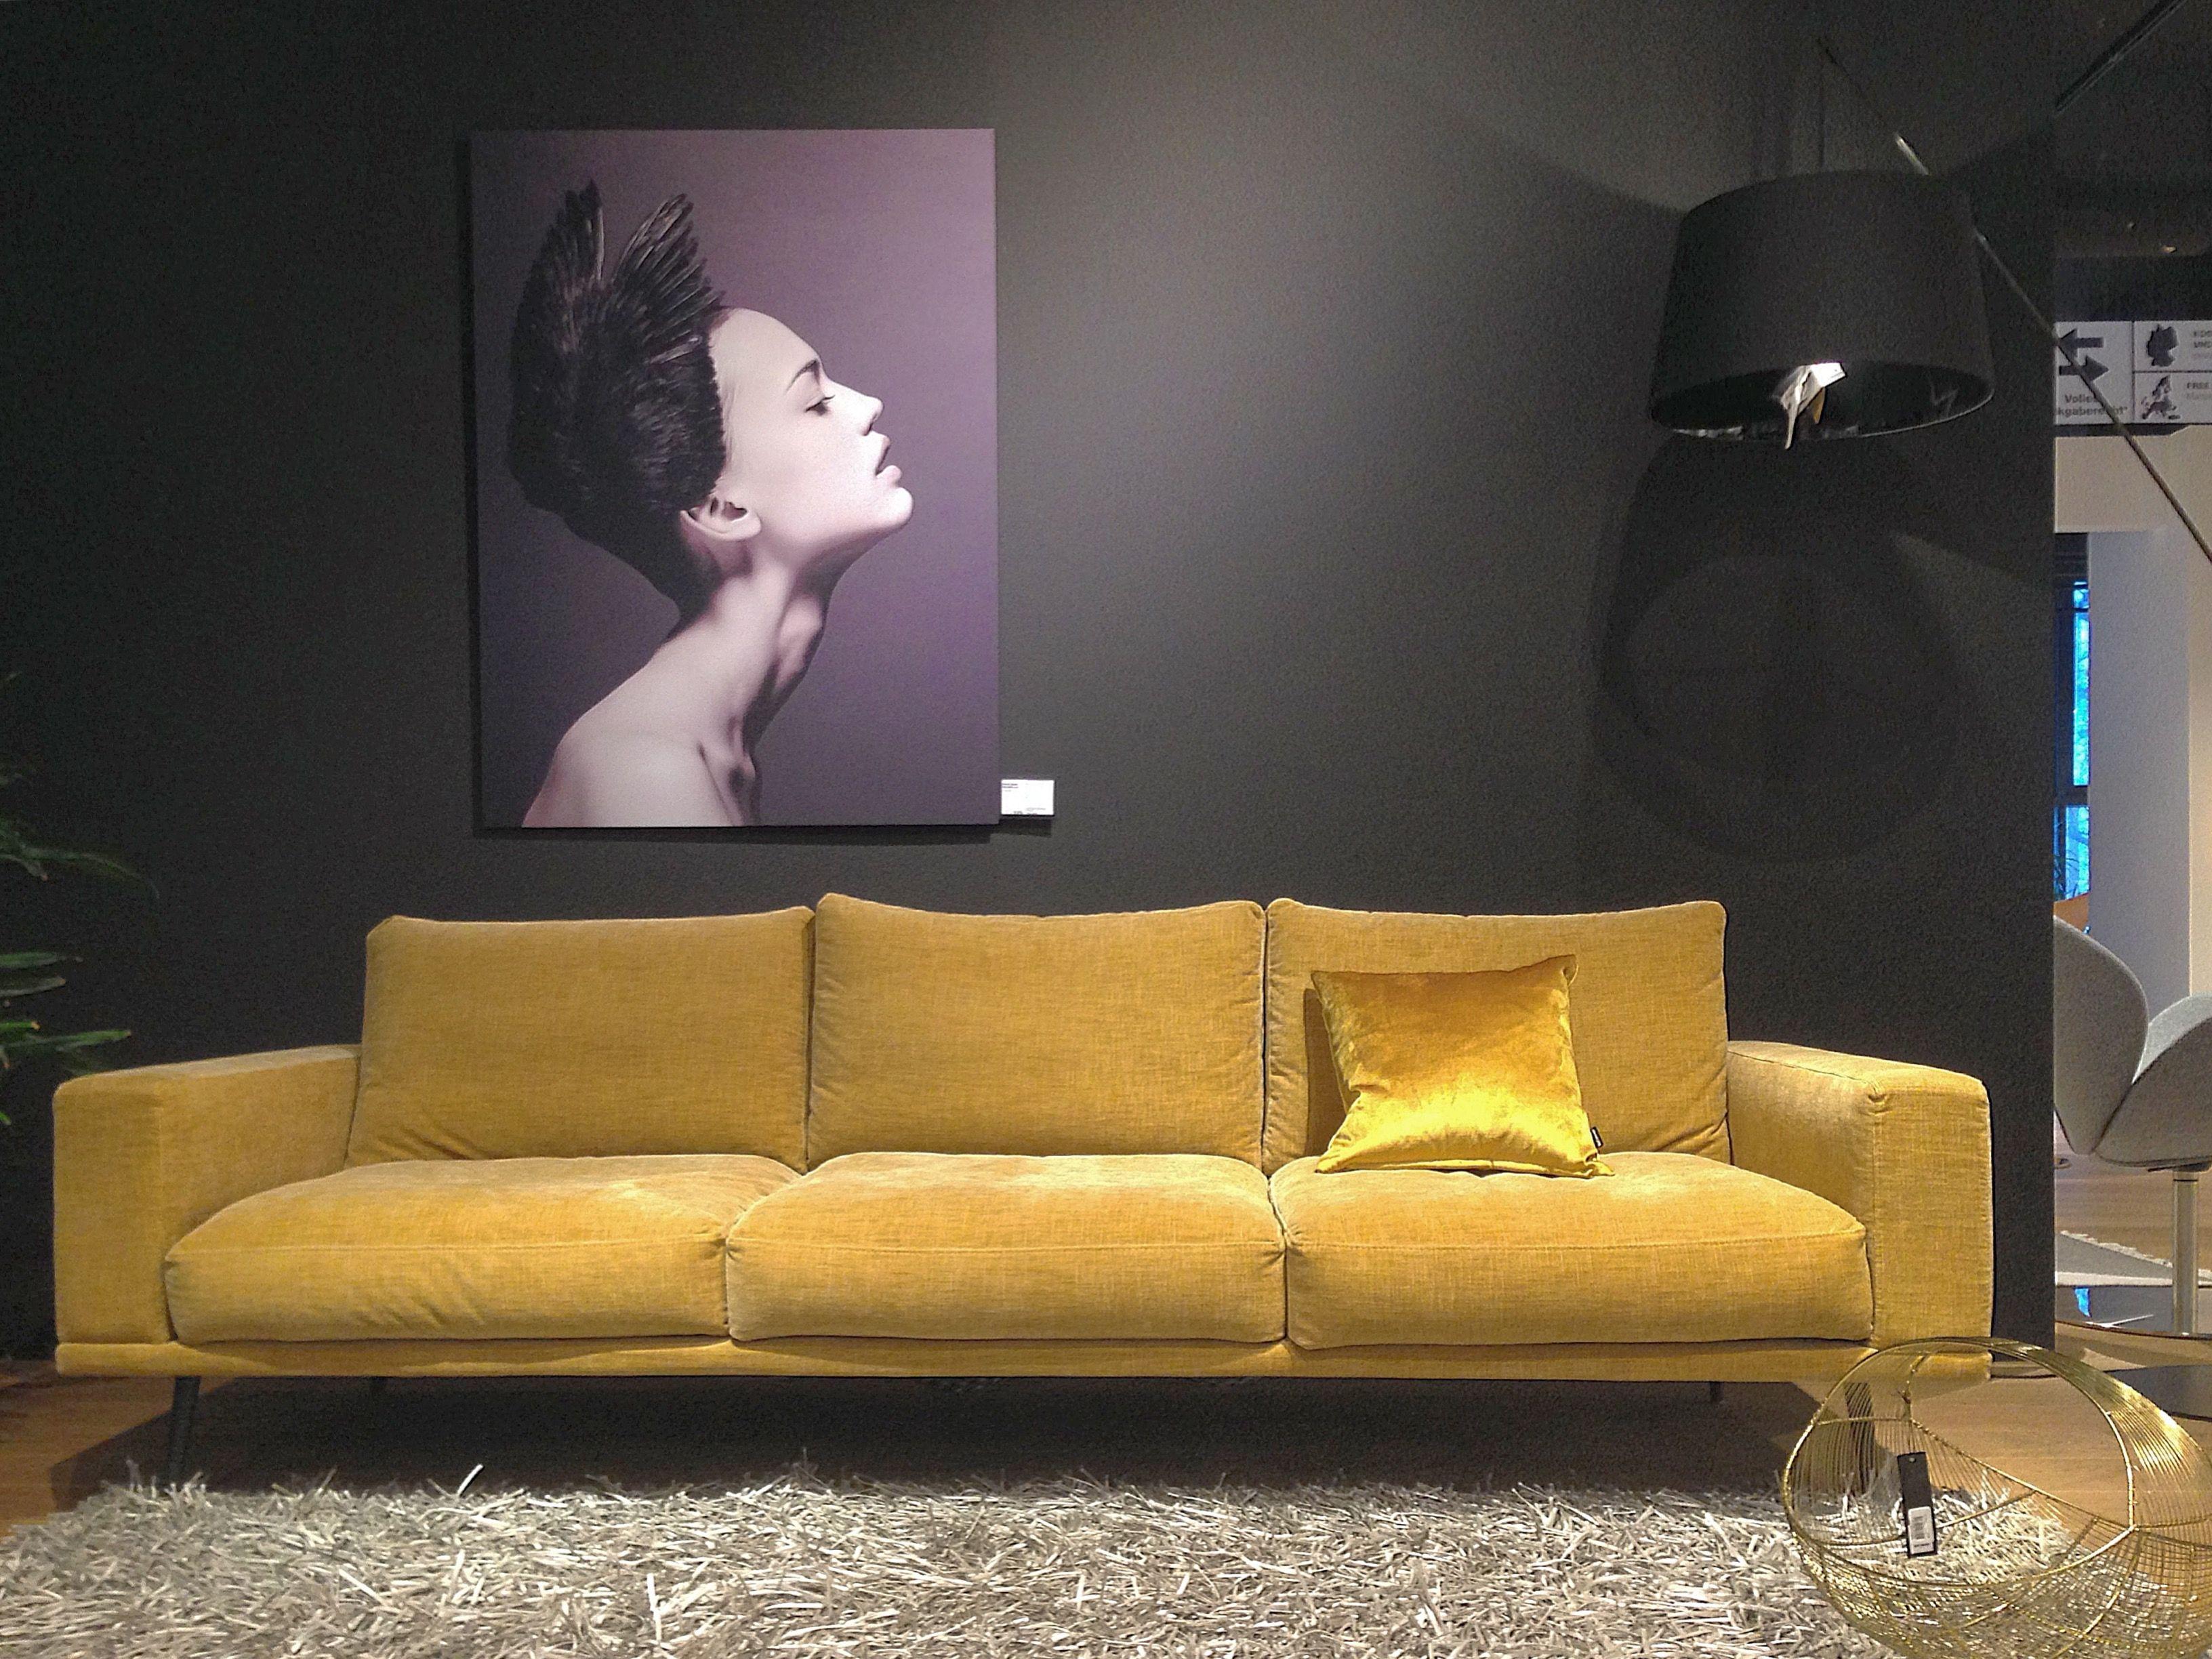 gelb gold atmosph re carlton sofa von boconcept in berlin schlo strasse boconcept berlin. Black Bedroom Furniture Sets. Home Design Ideas